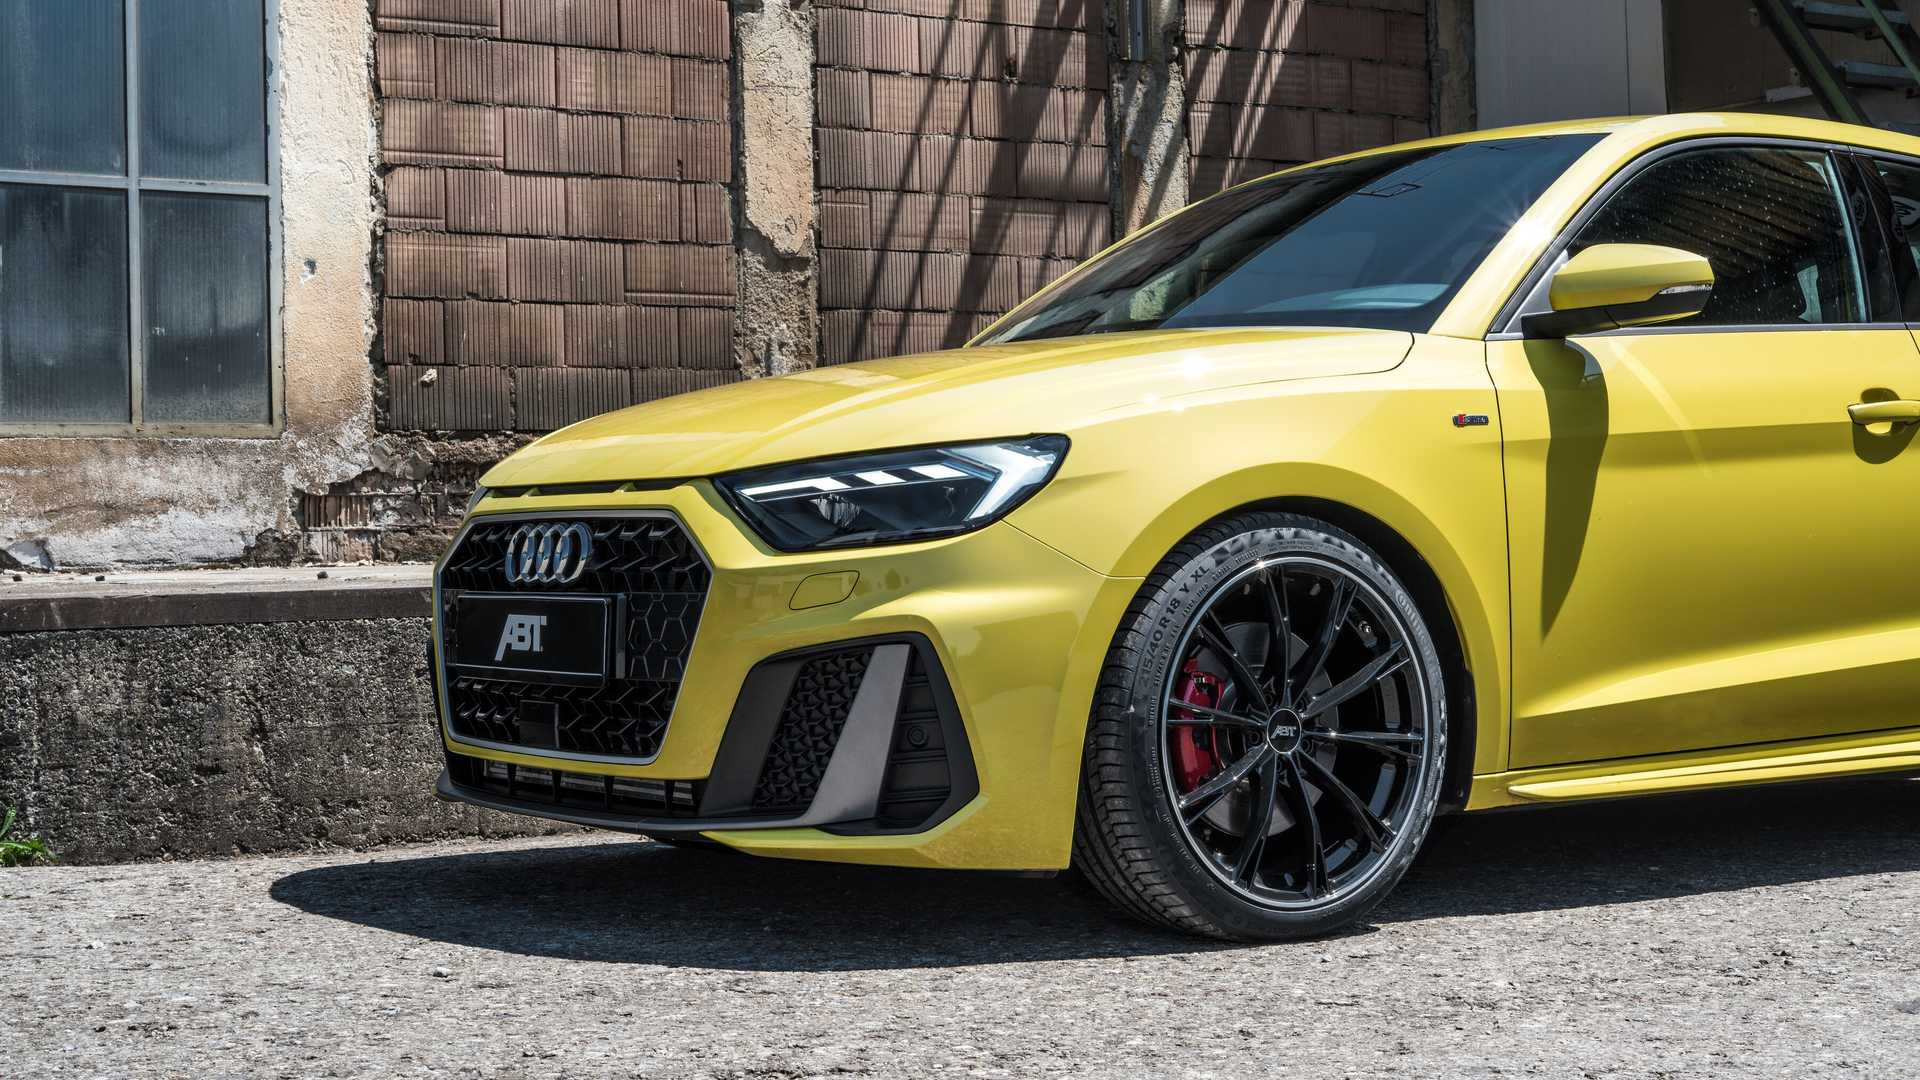 Audi_A1_Sportback_by_ABT_0004